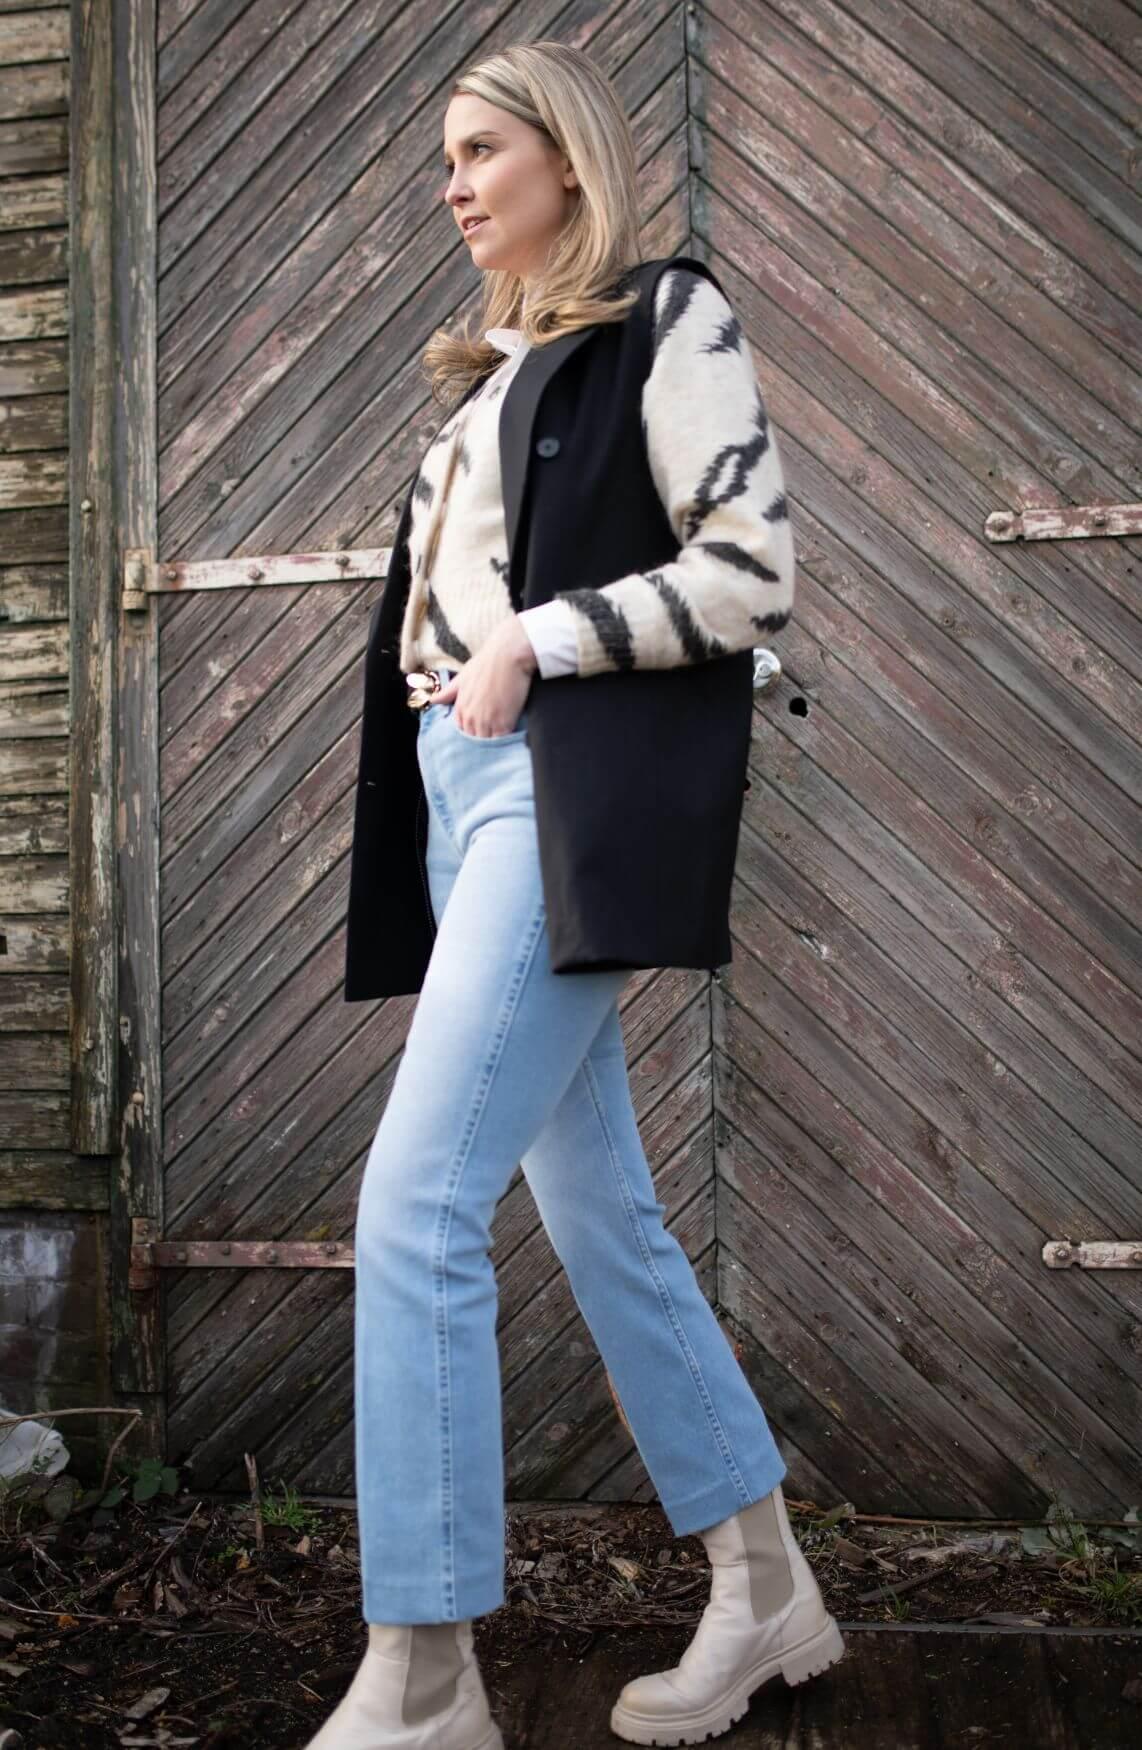 Co Couture Dames Chloe oversized gilet Zwart